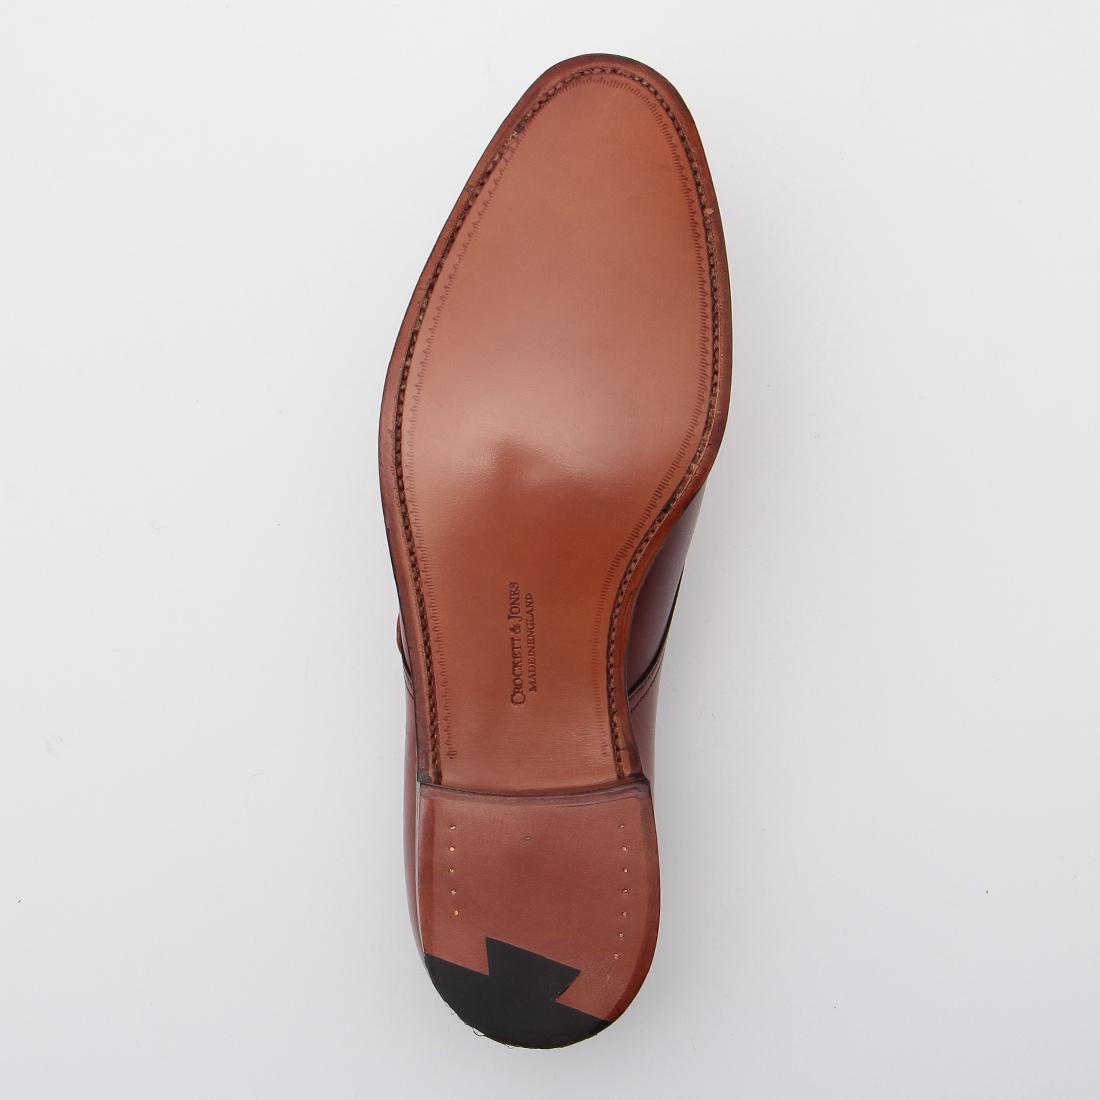 Malvern: Leather Sole